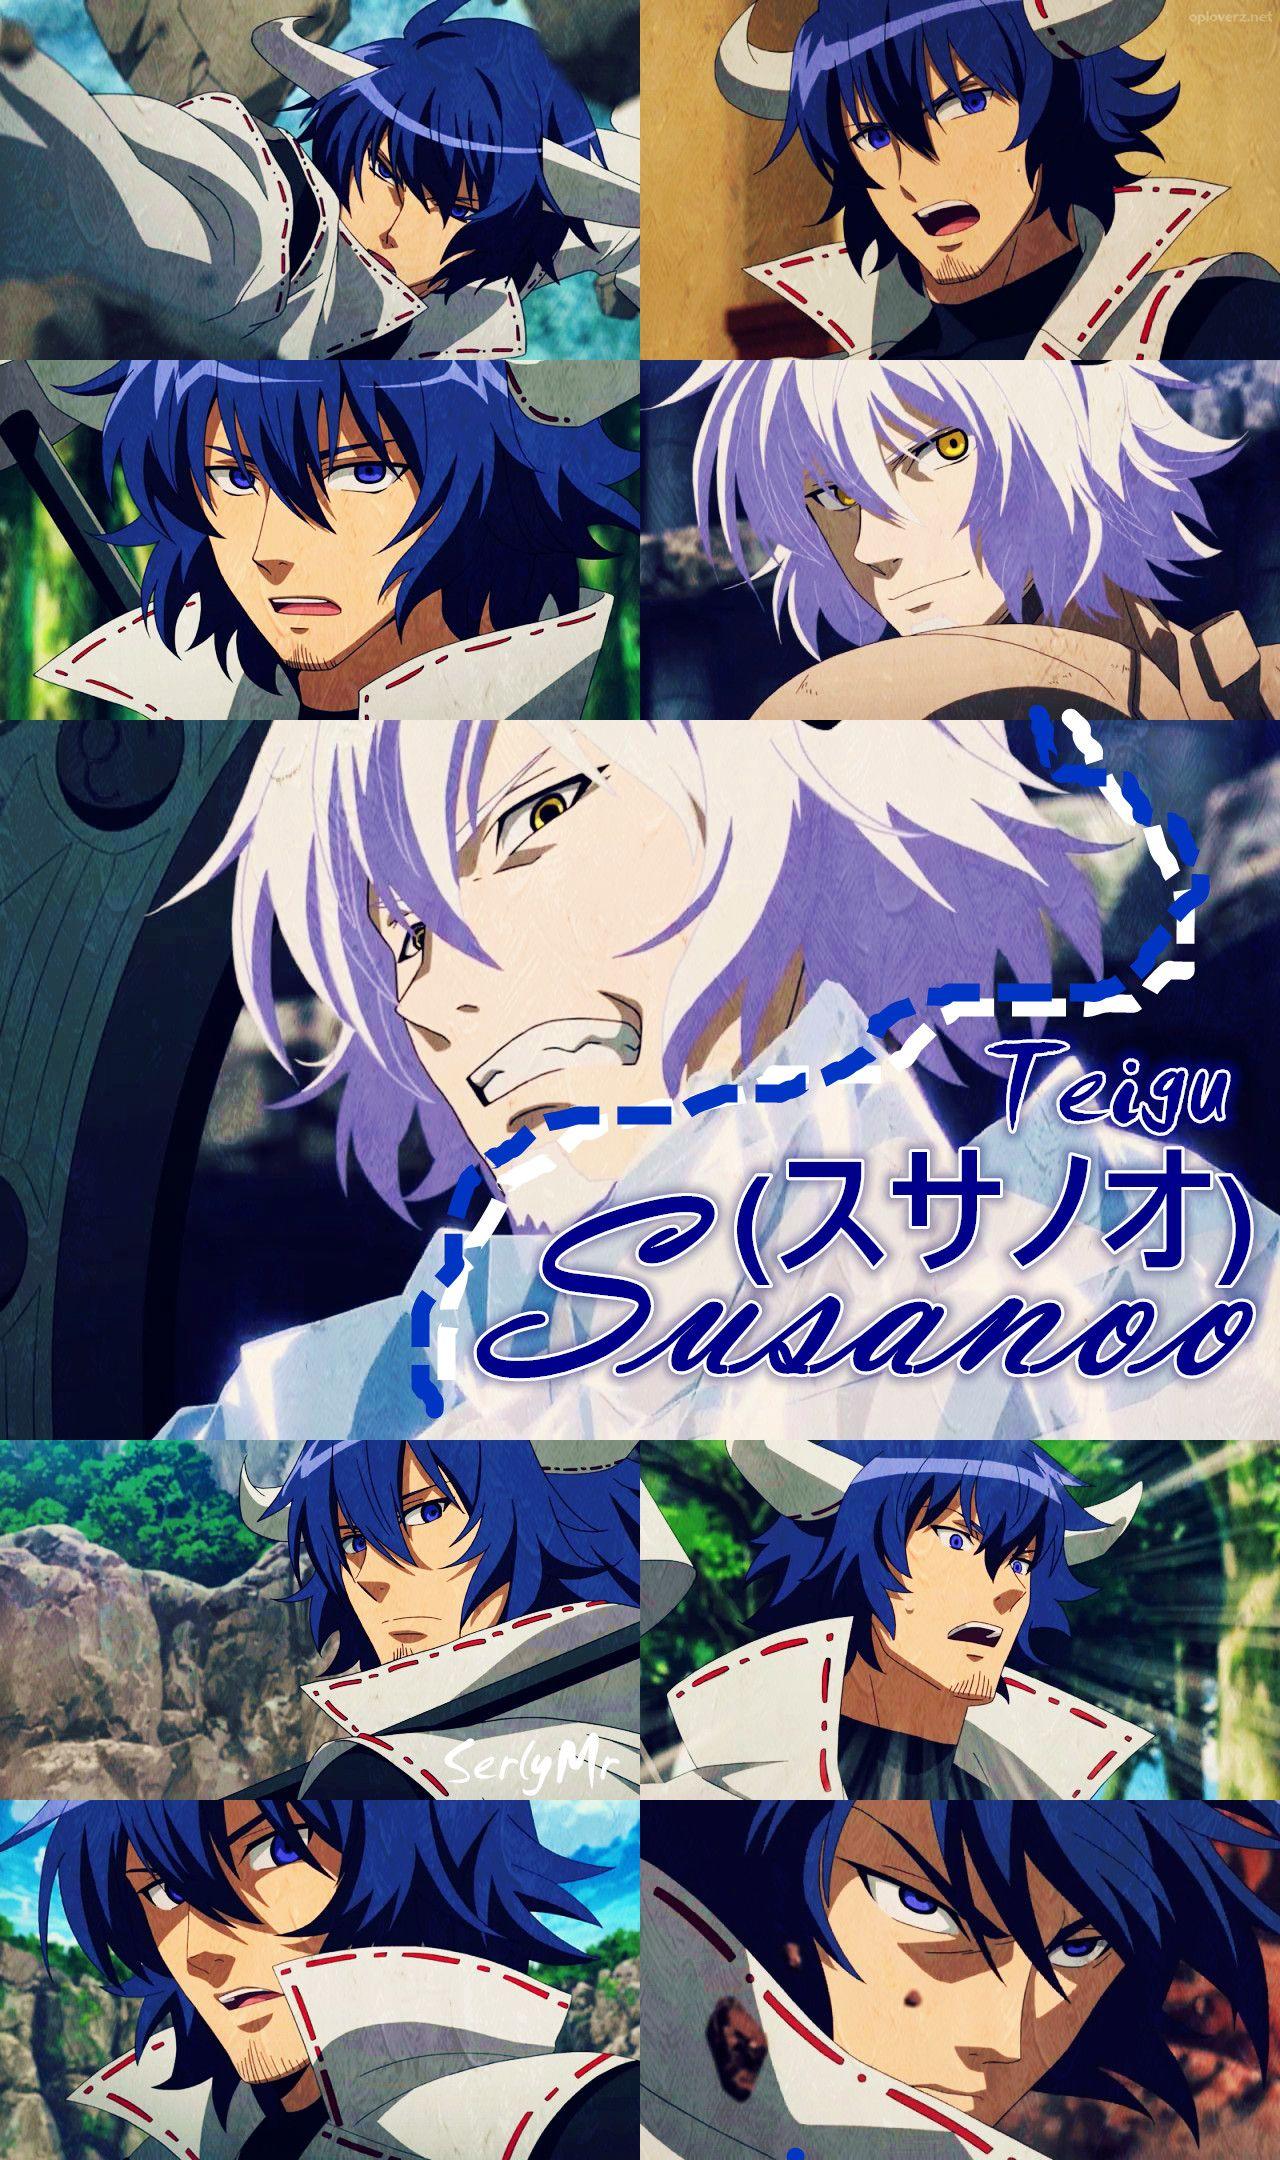 Susanoo Night Raid ( Akame ga Kill ) by serlyharuno (Dengan gambar)